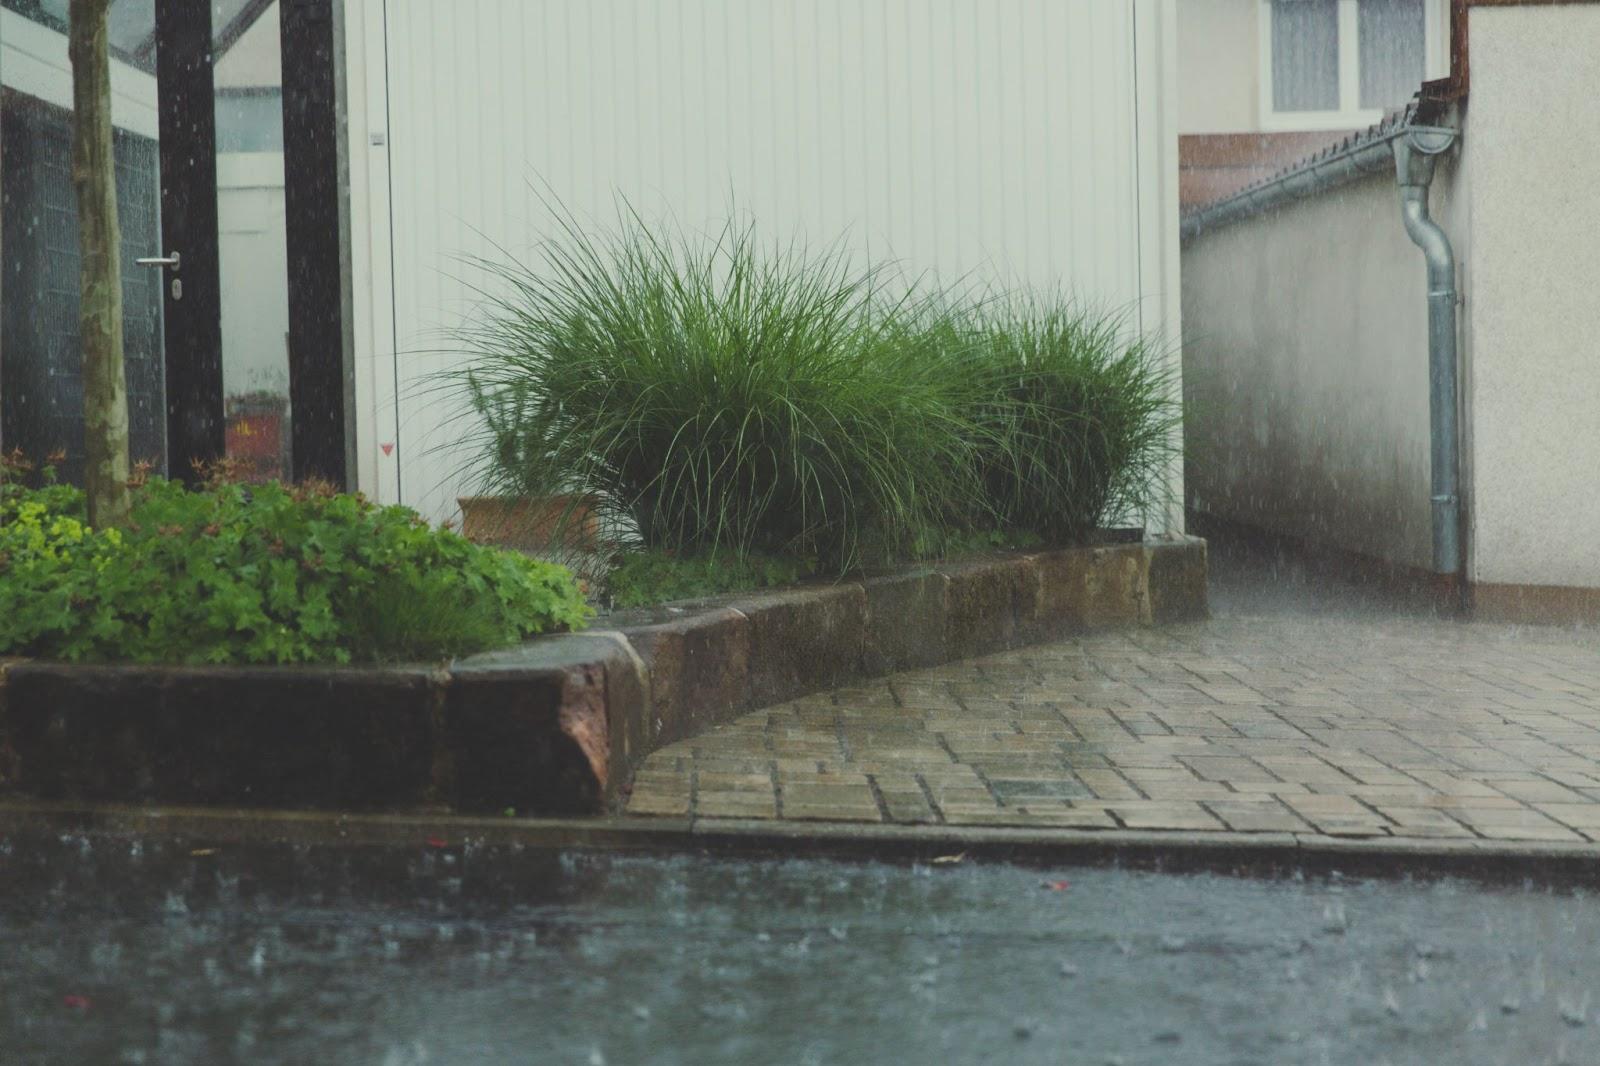 Storm event causing flooding